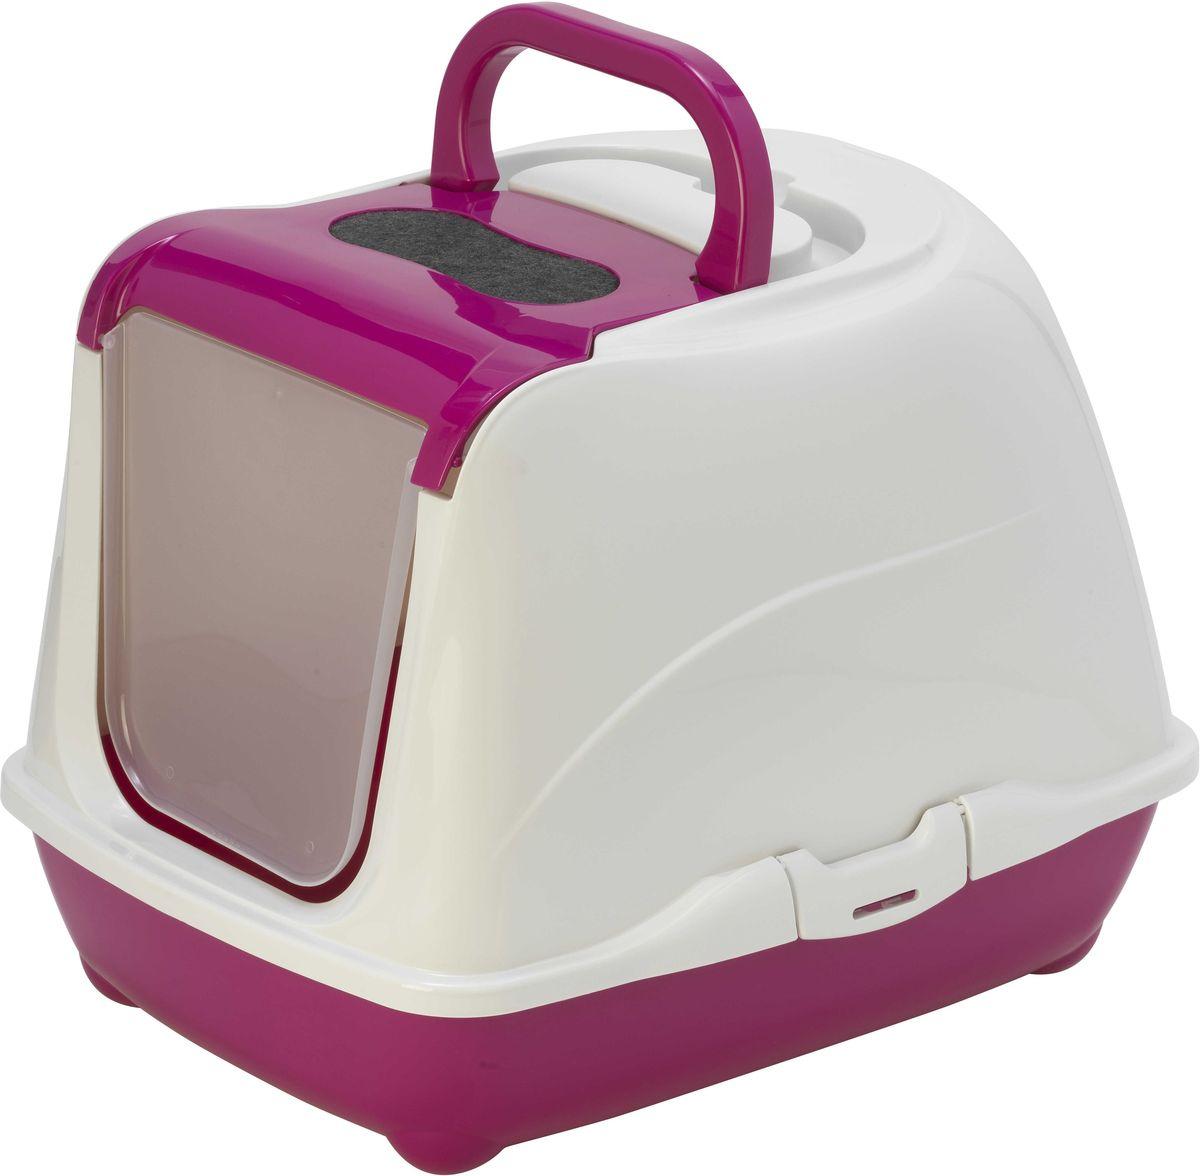 "Туалет для кошек Moderna ""Flip Cat"", закрытый, цвет: ярко-розовый, 39 х 50 х 37 см"